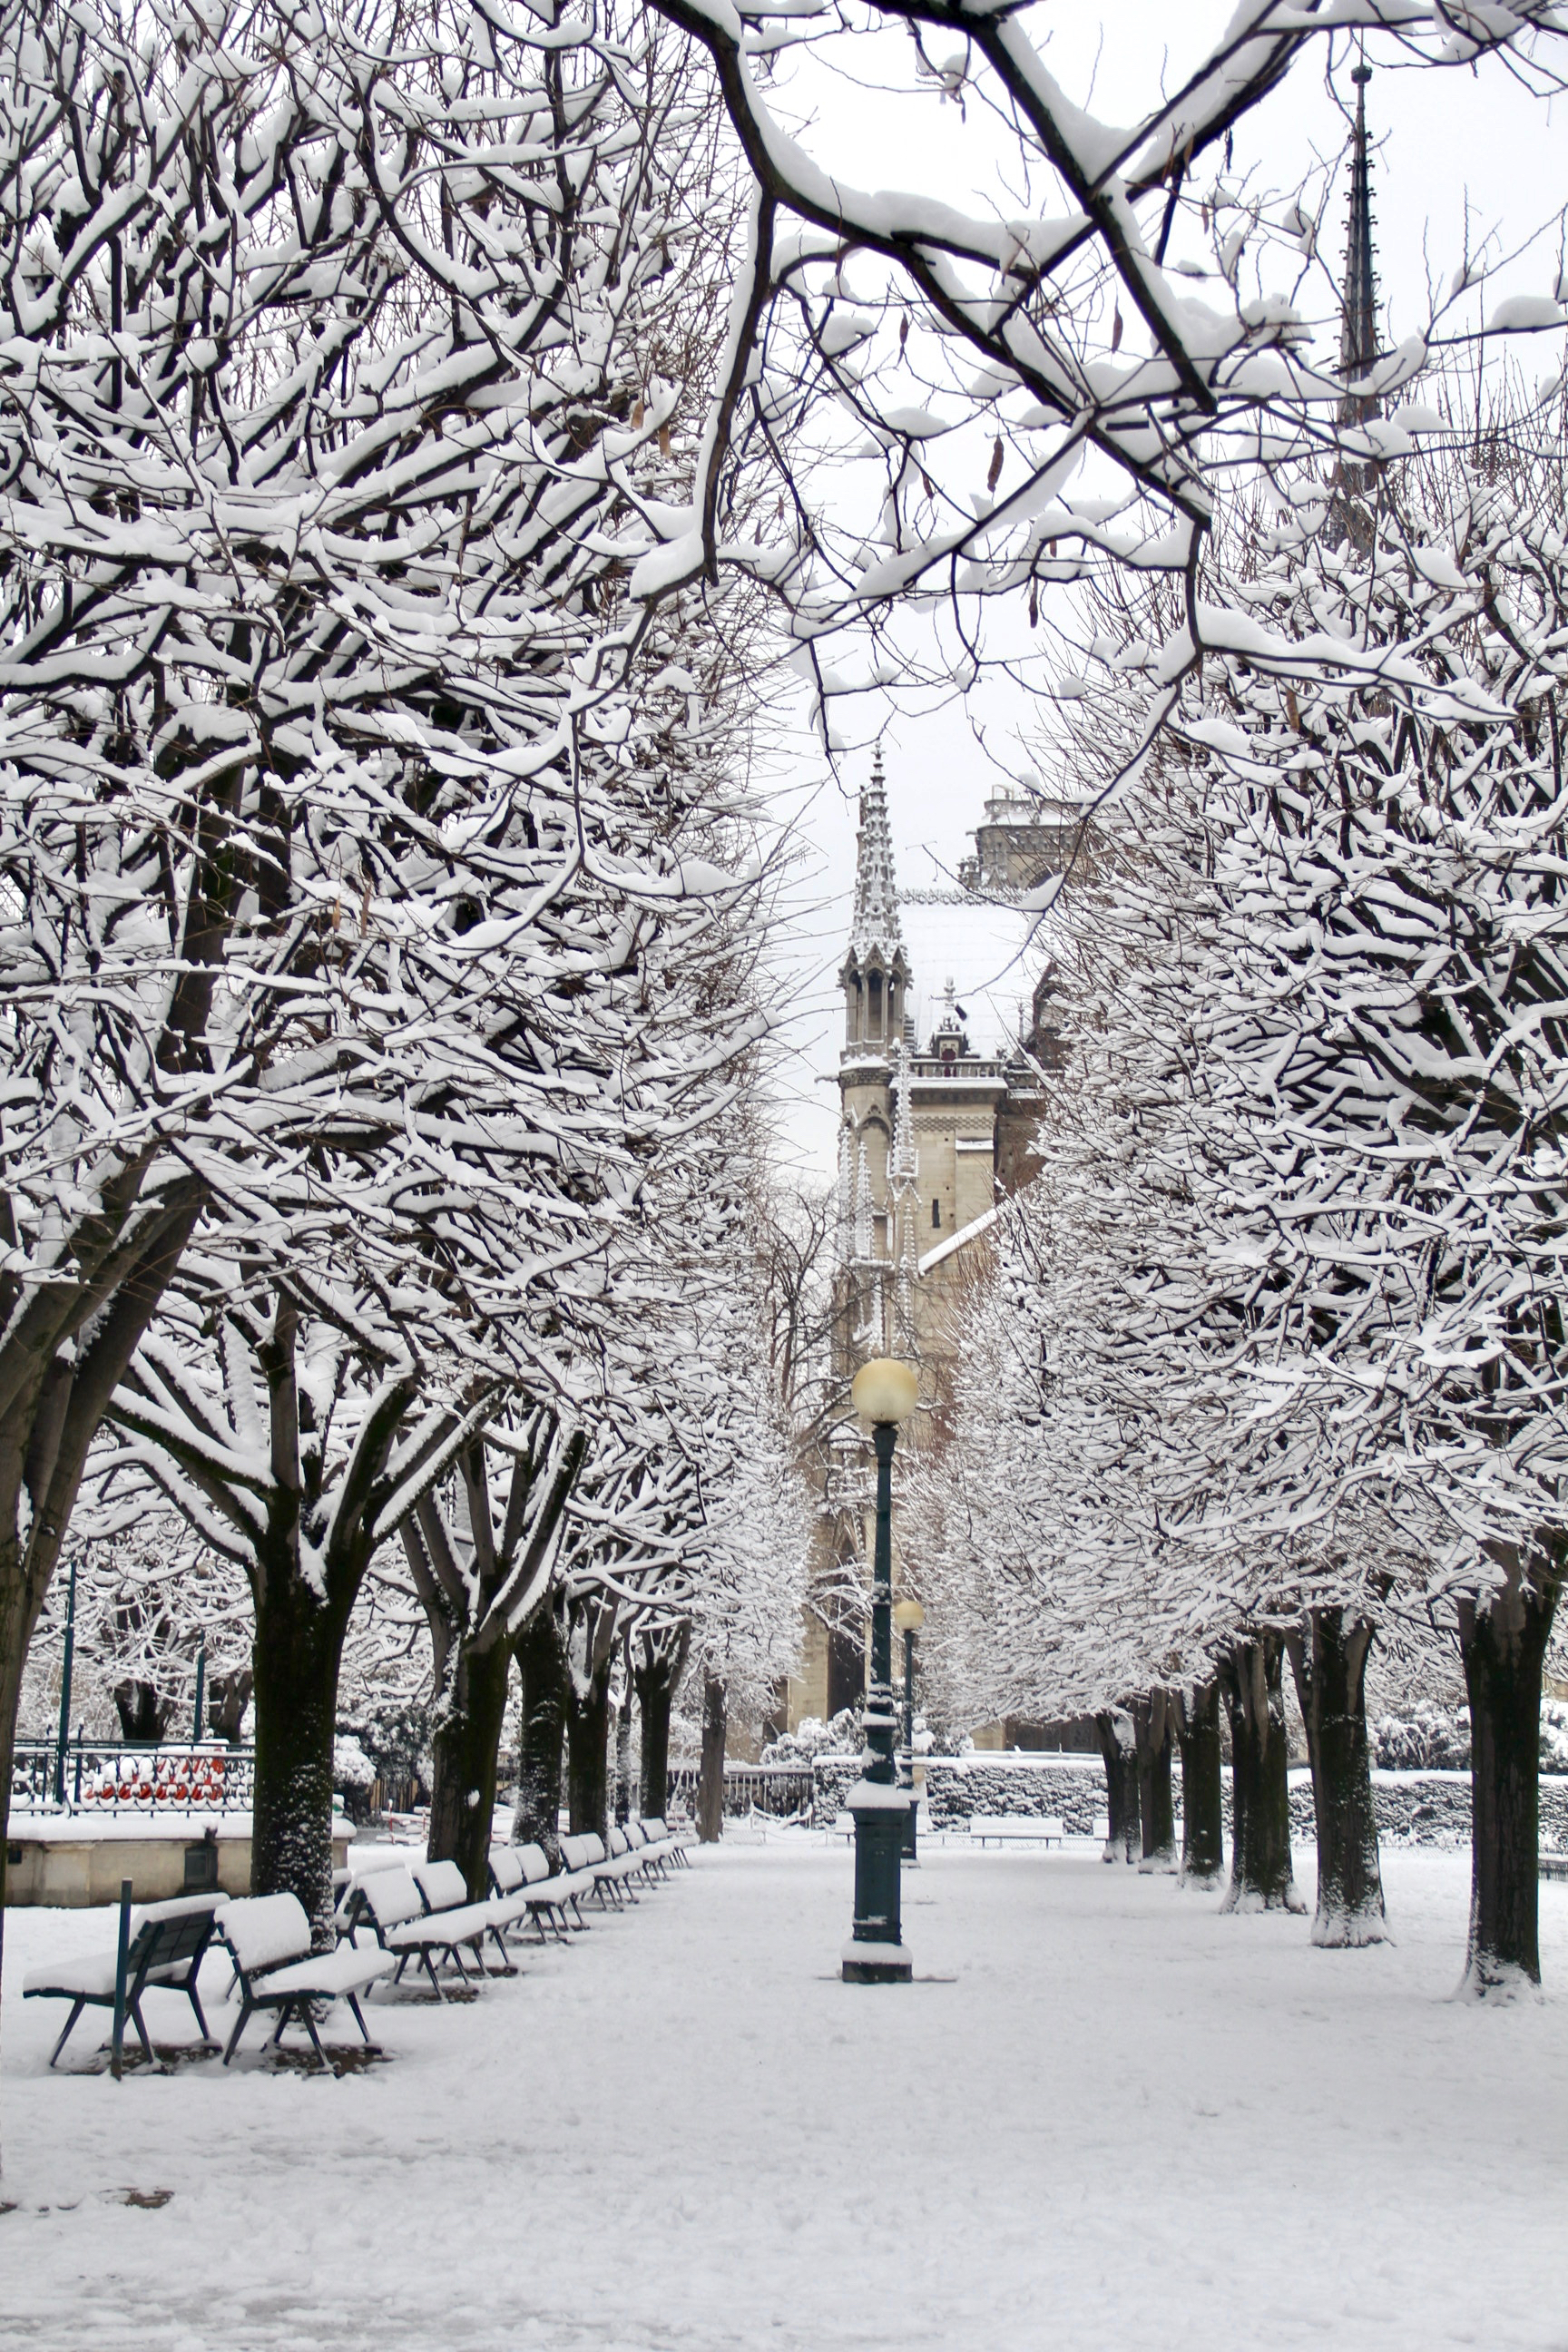 Snowy Paris - 28